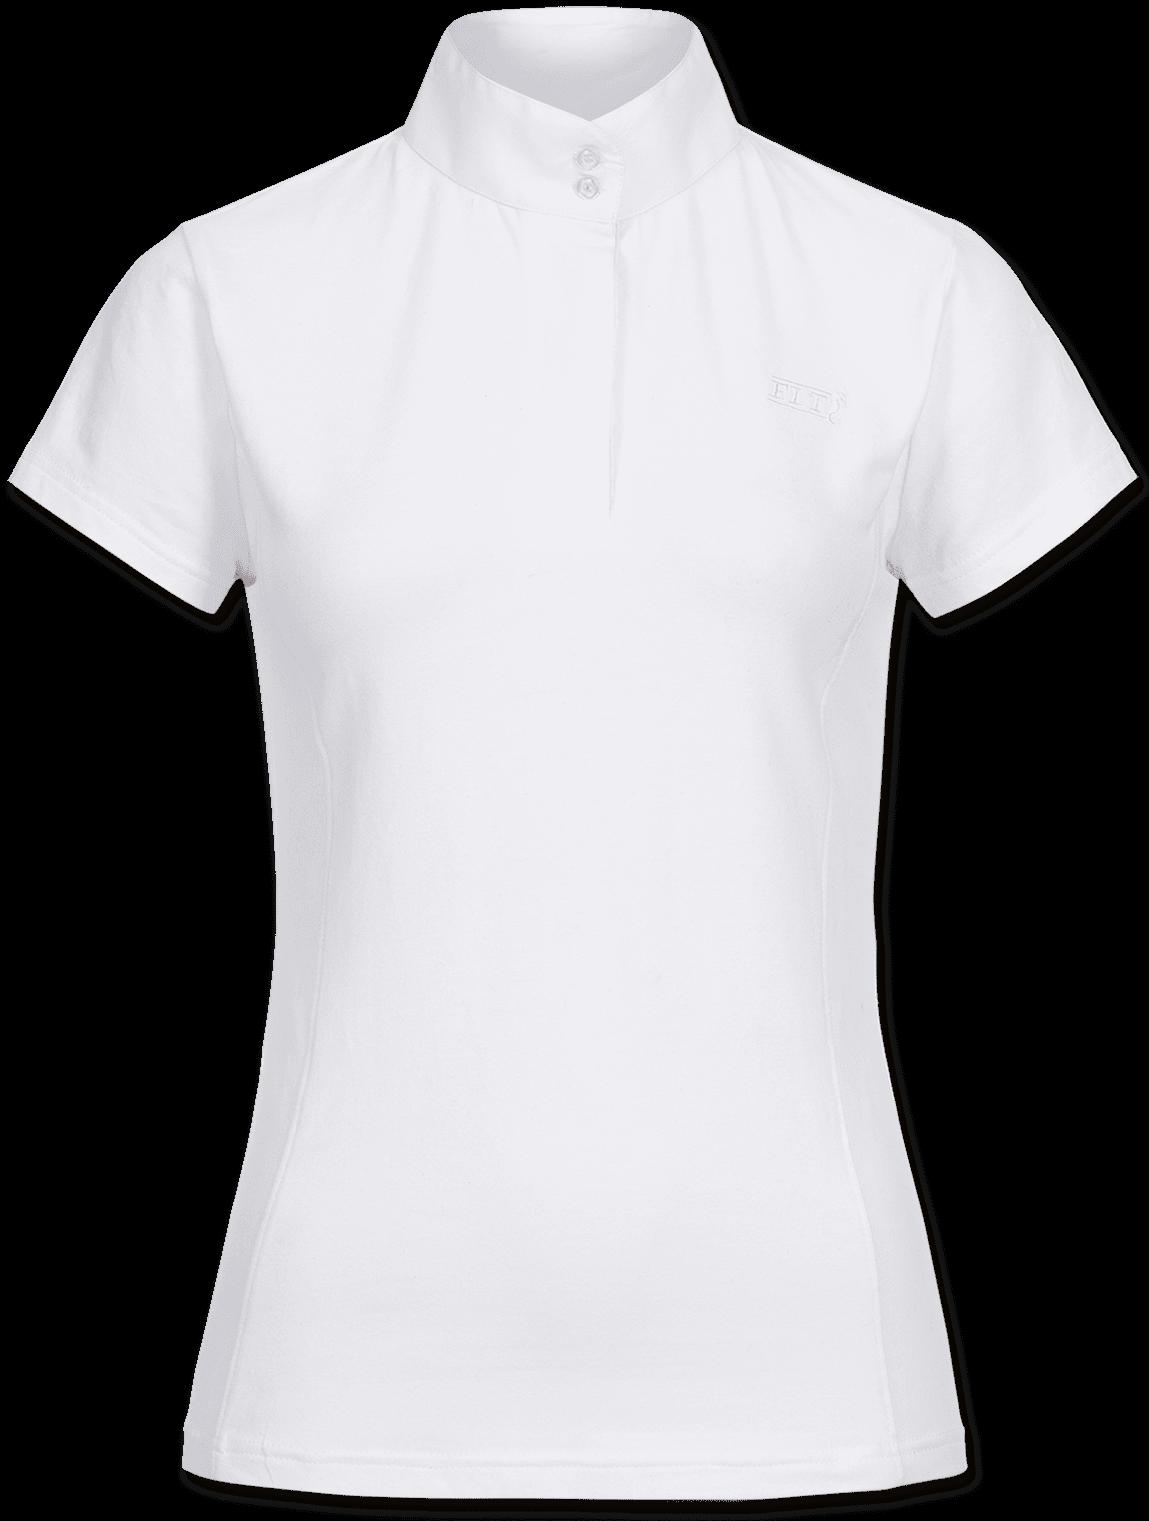 Fehér női pólók | darab - setalo.hu